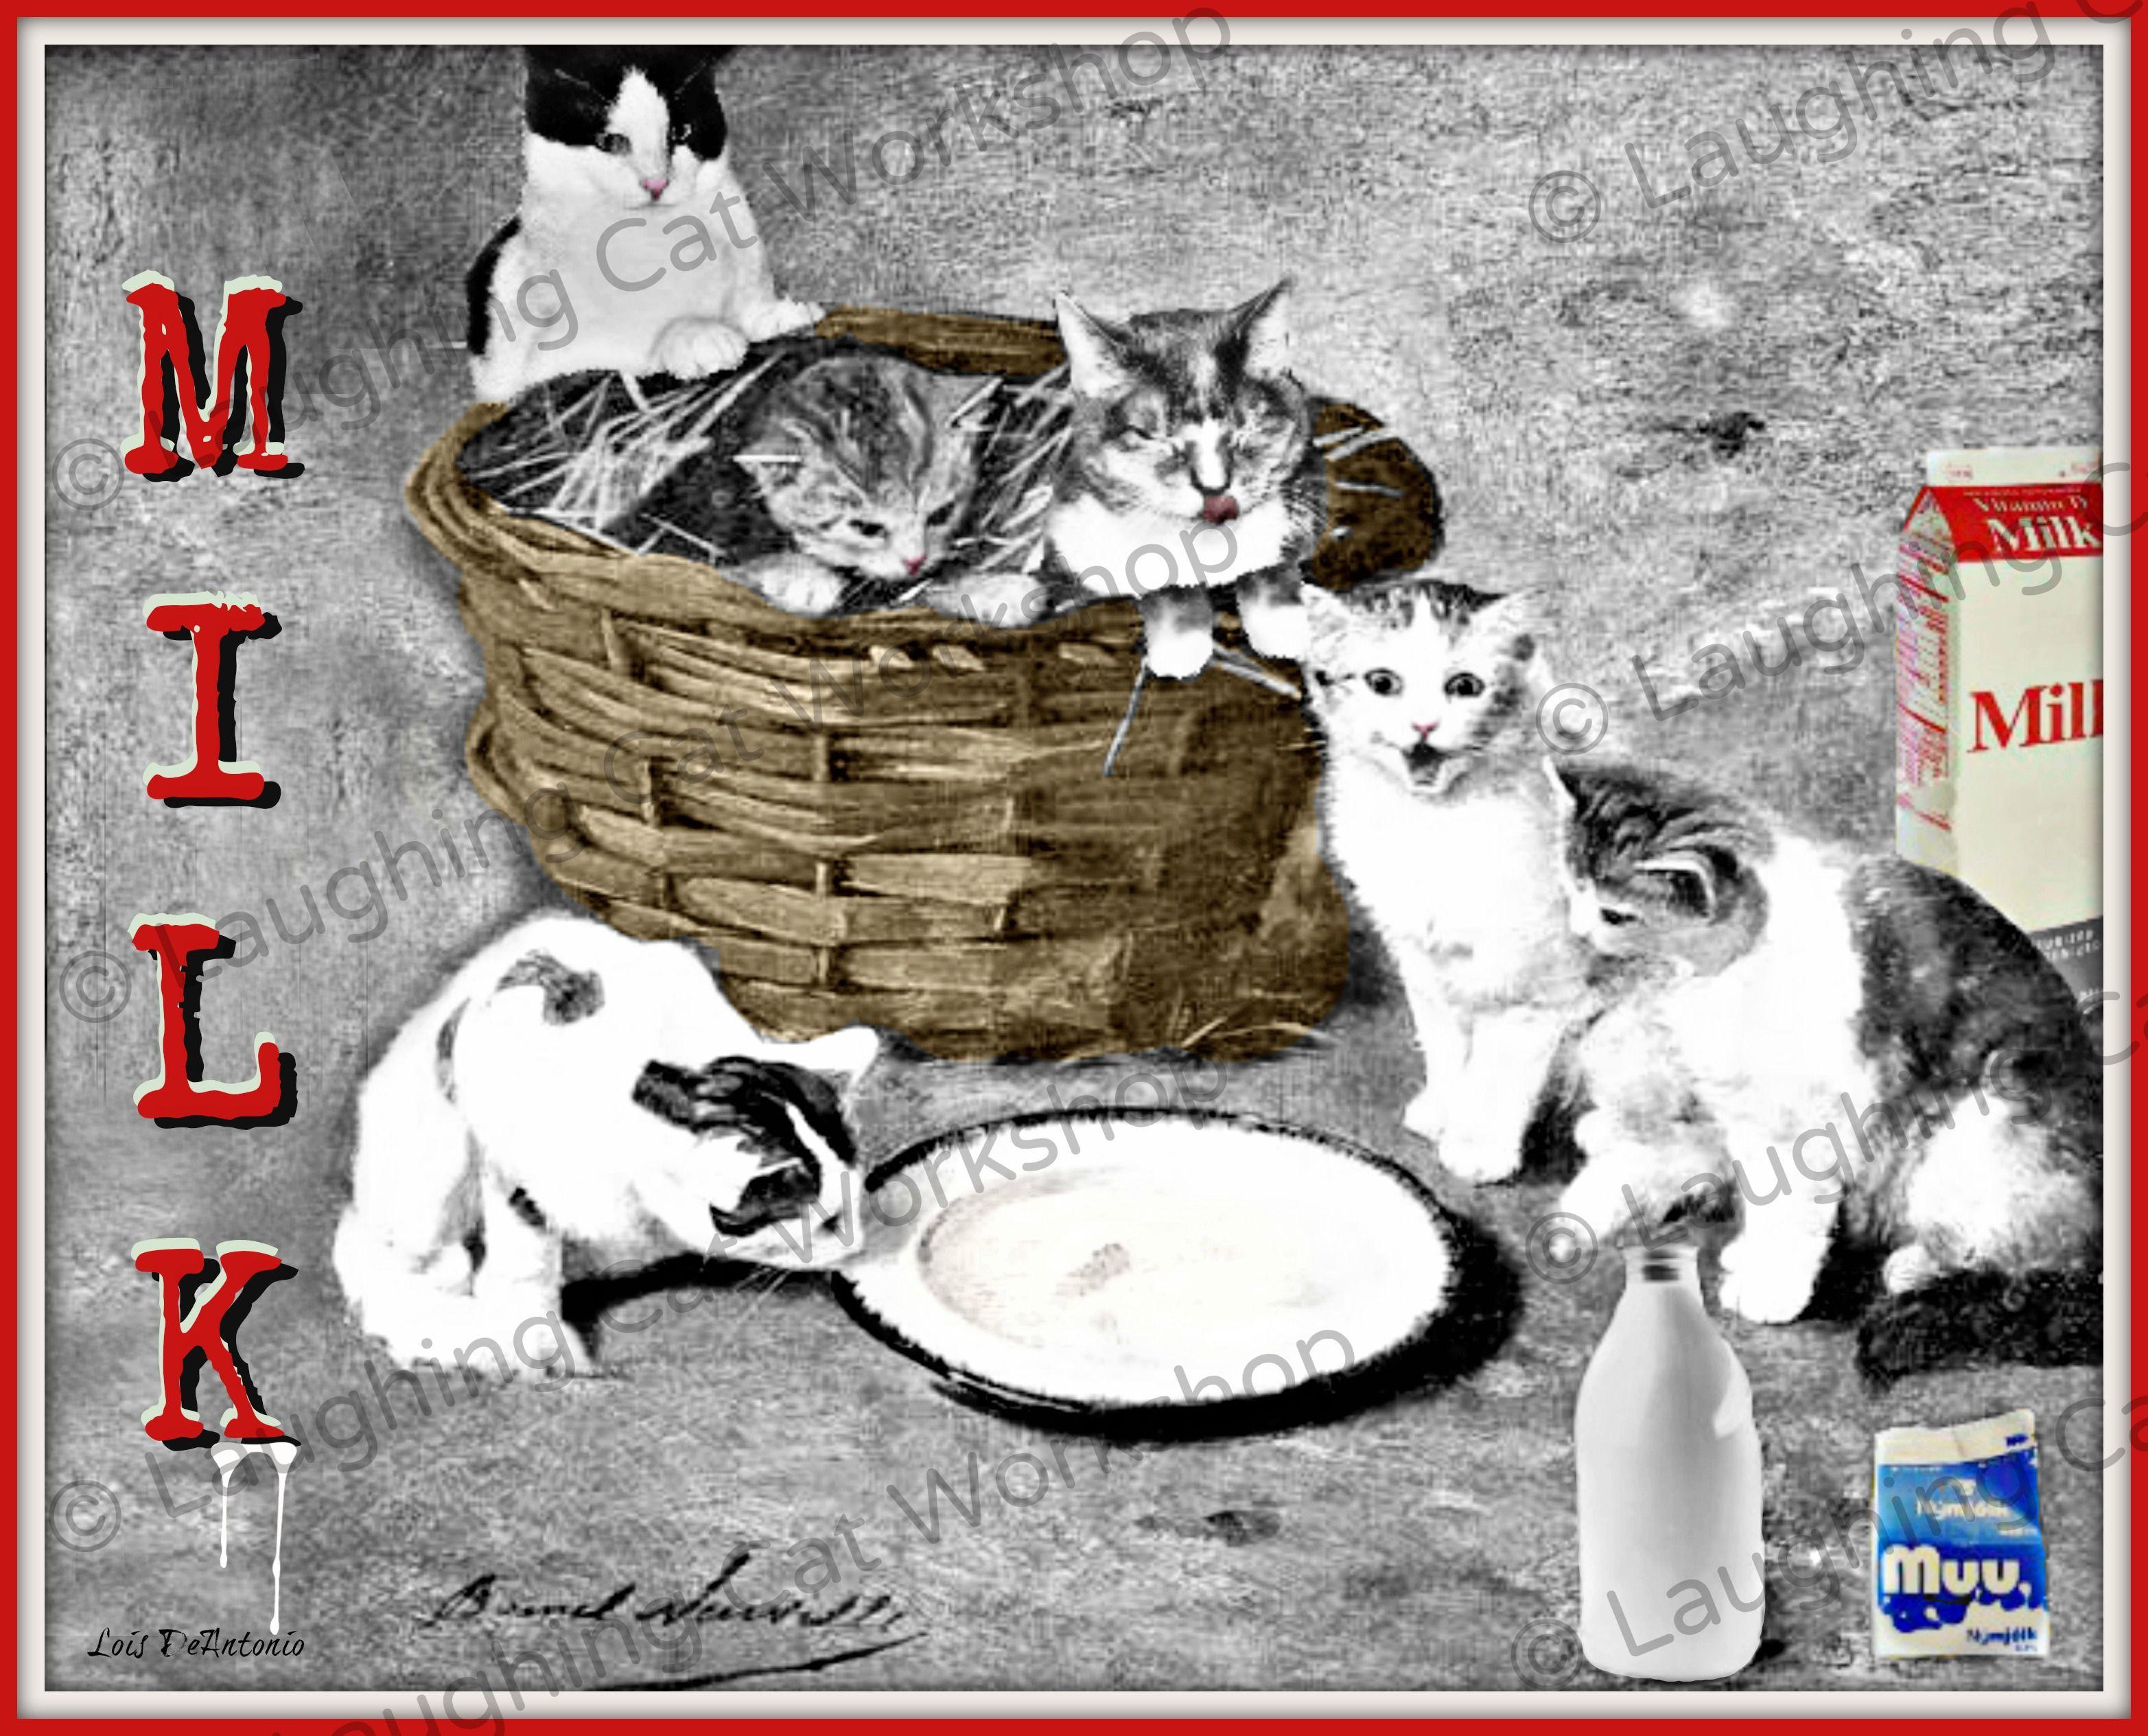 Meooow! NationalMilkDay milk Meow MilkDay drink